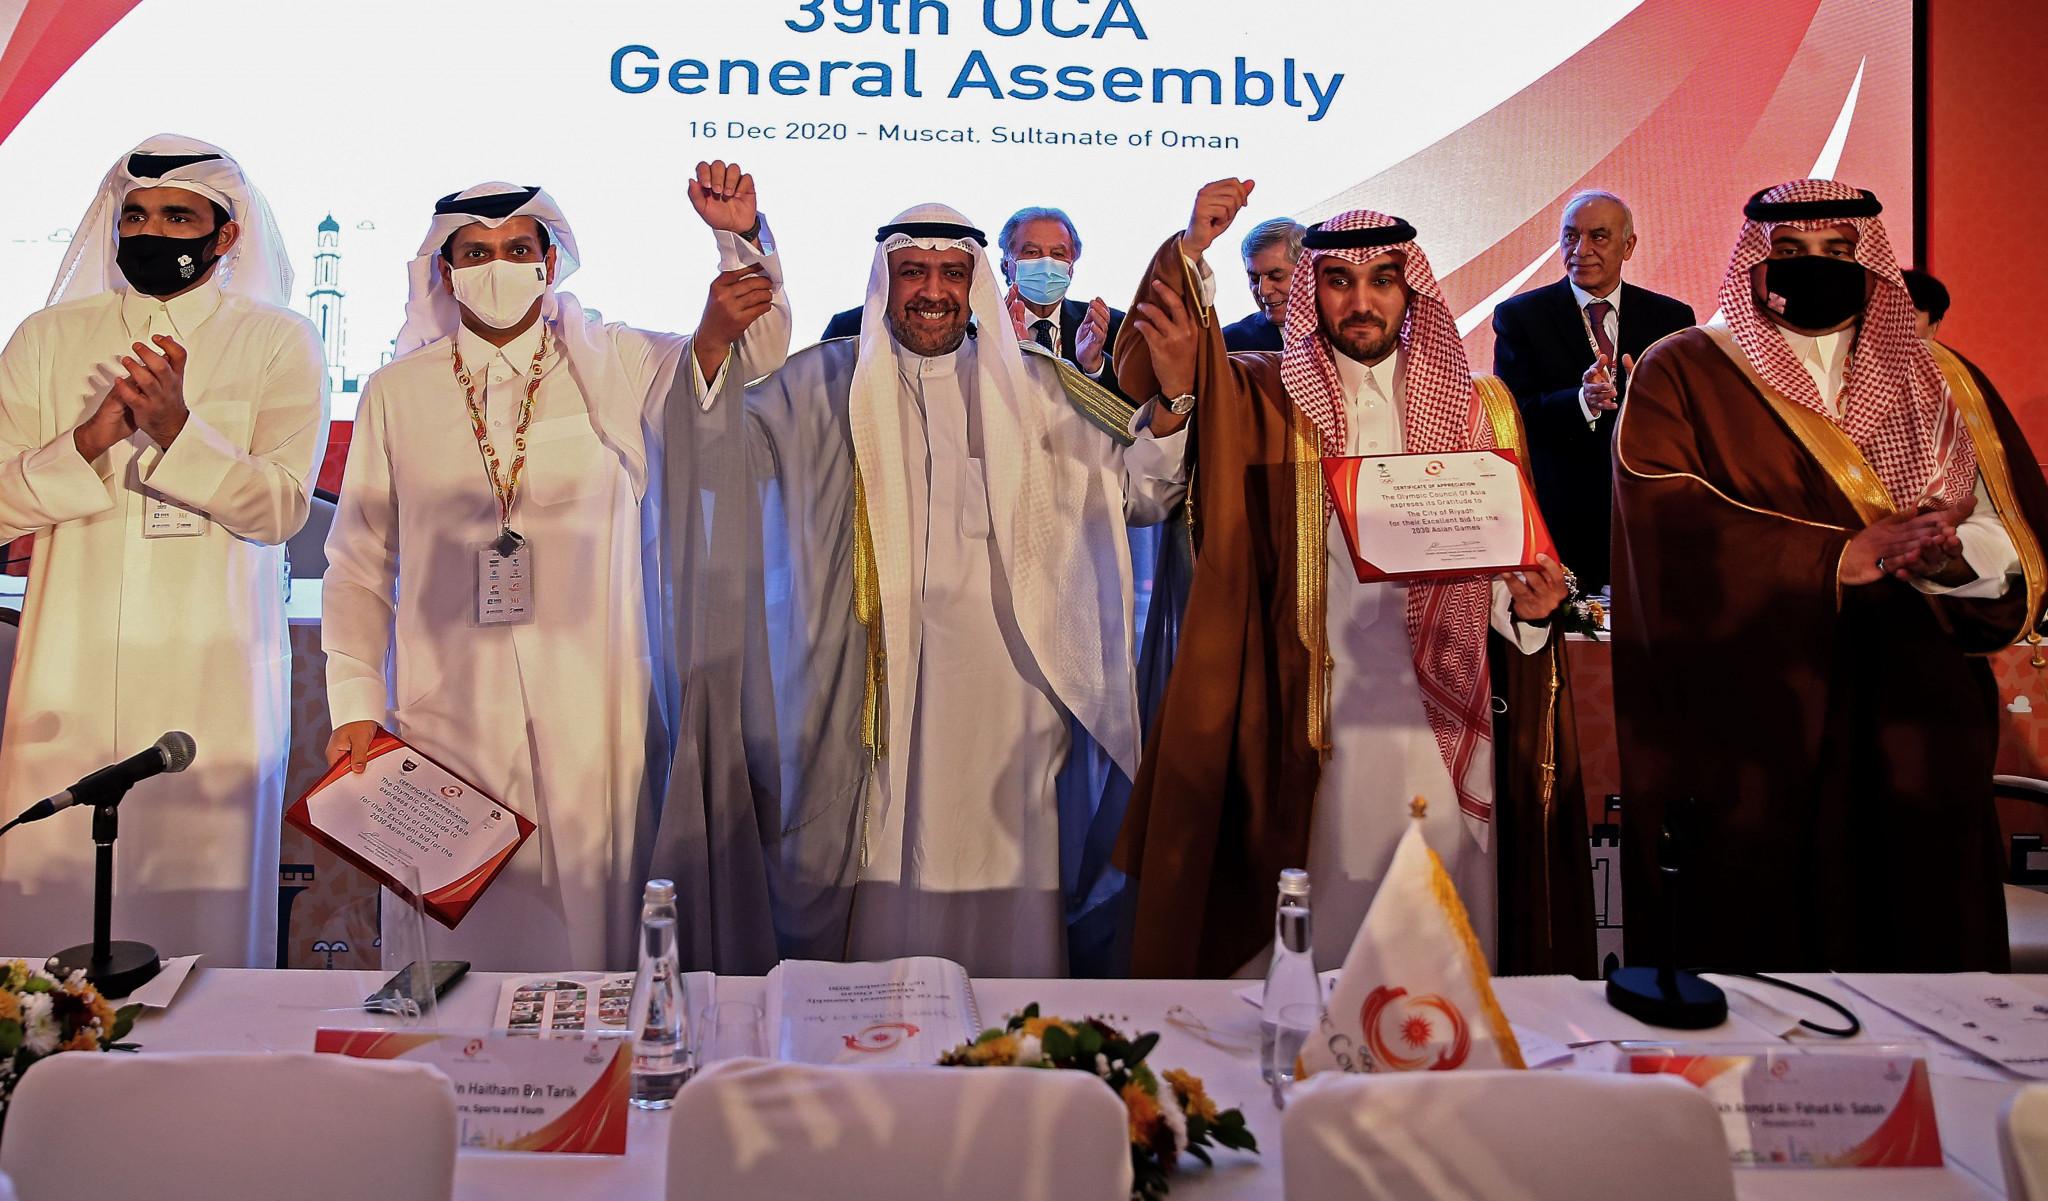 Sheikh Ahmad Al-Fahad Al-Sabah raises hands from Doha and Riyadh after the double award ©Getty Images